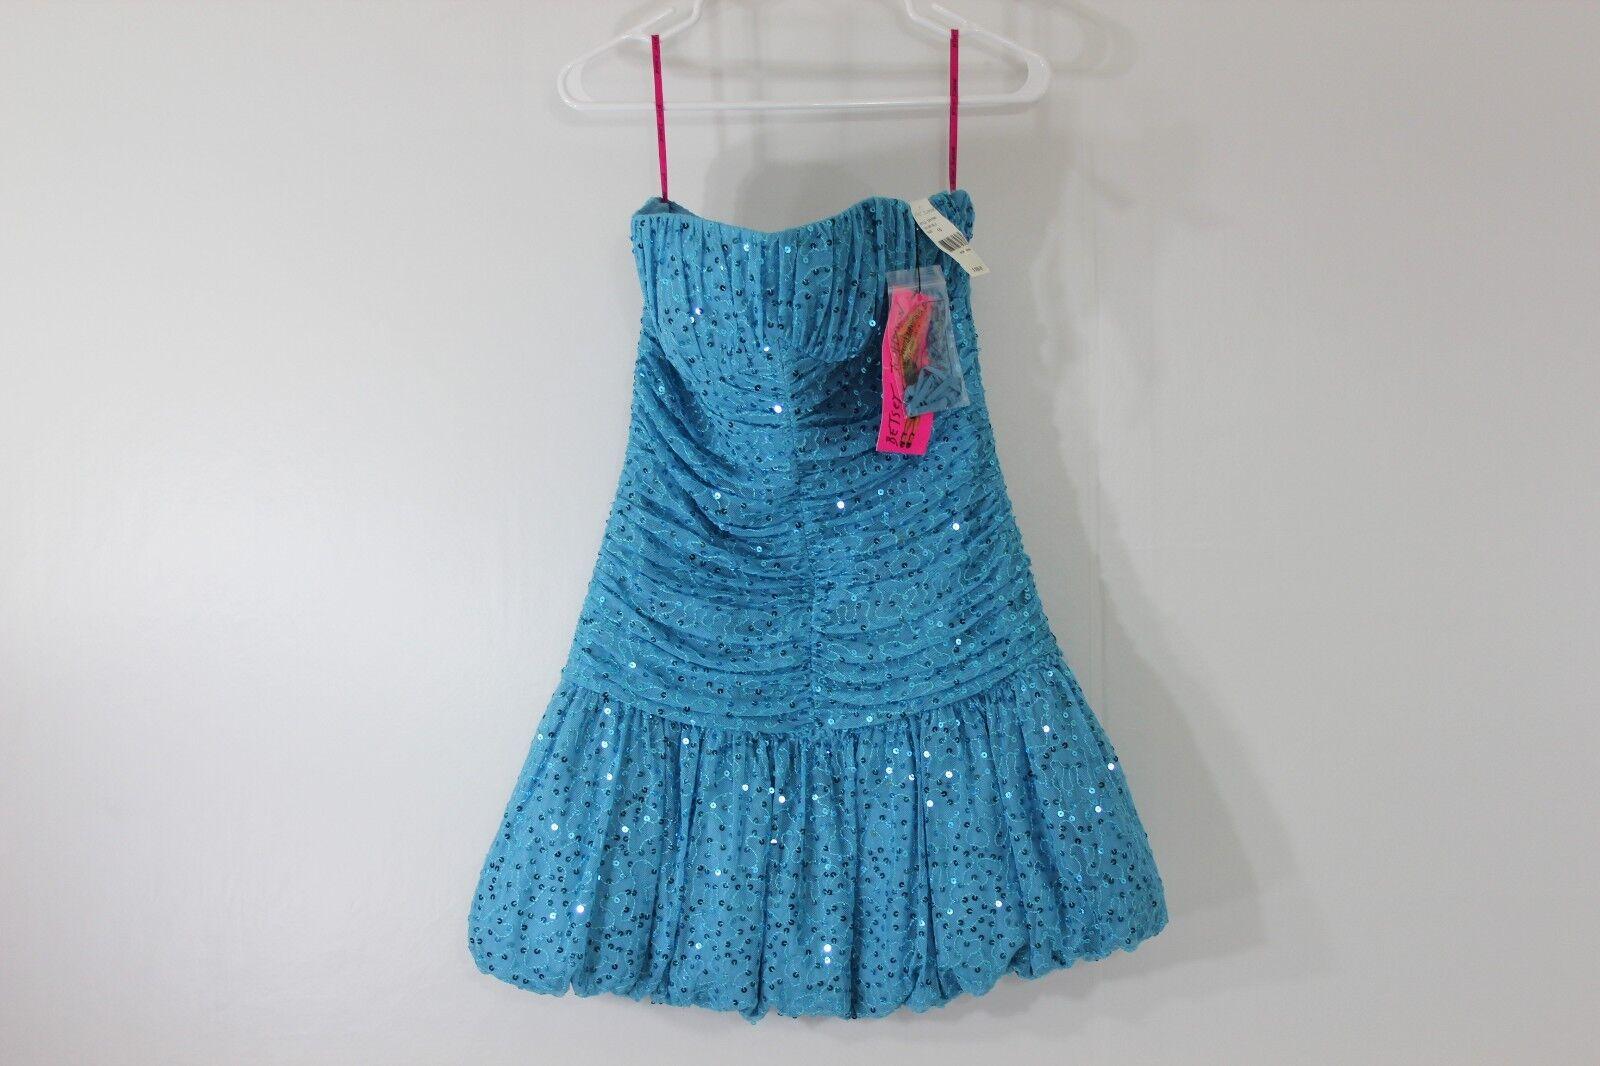 Betsy Johnson Womens 10 Aqua bluee Strapless Halter Sequin Formal Prom Dress NEW